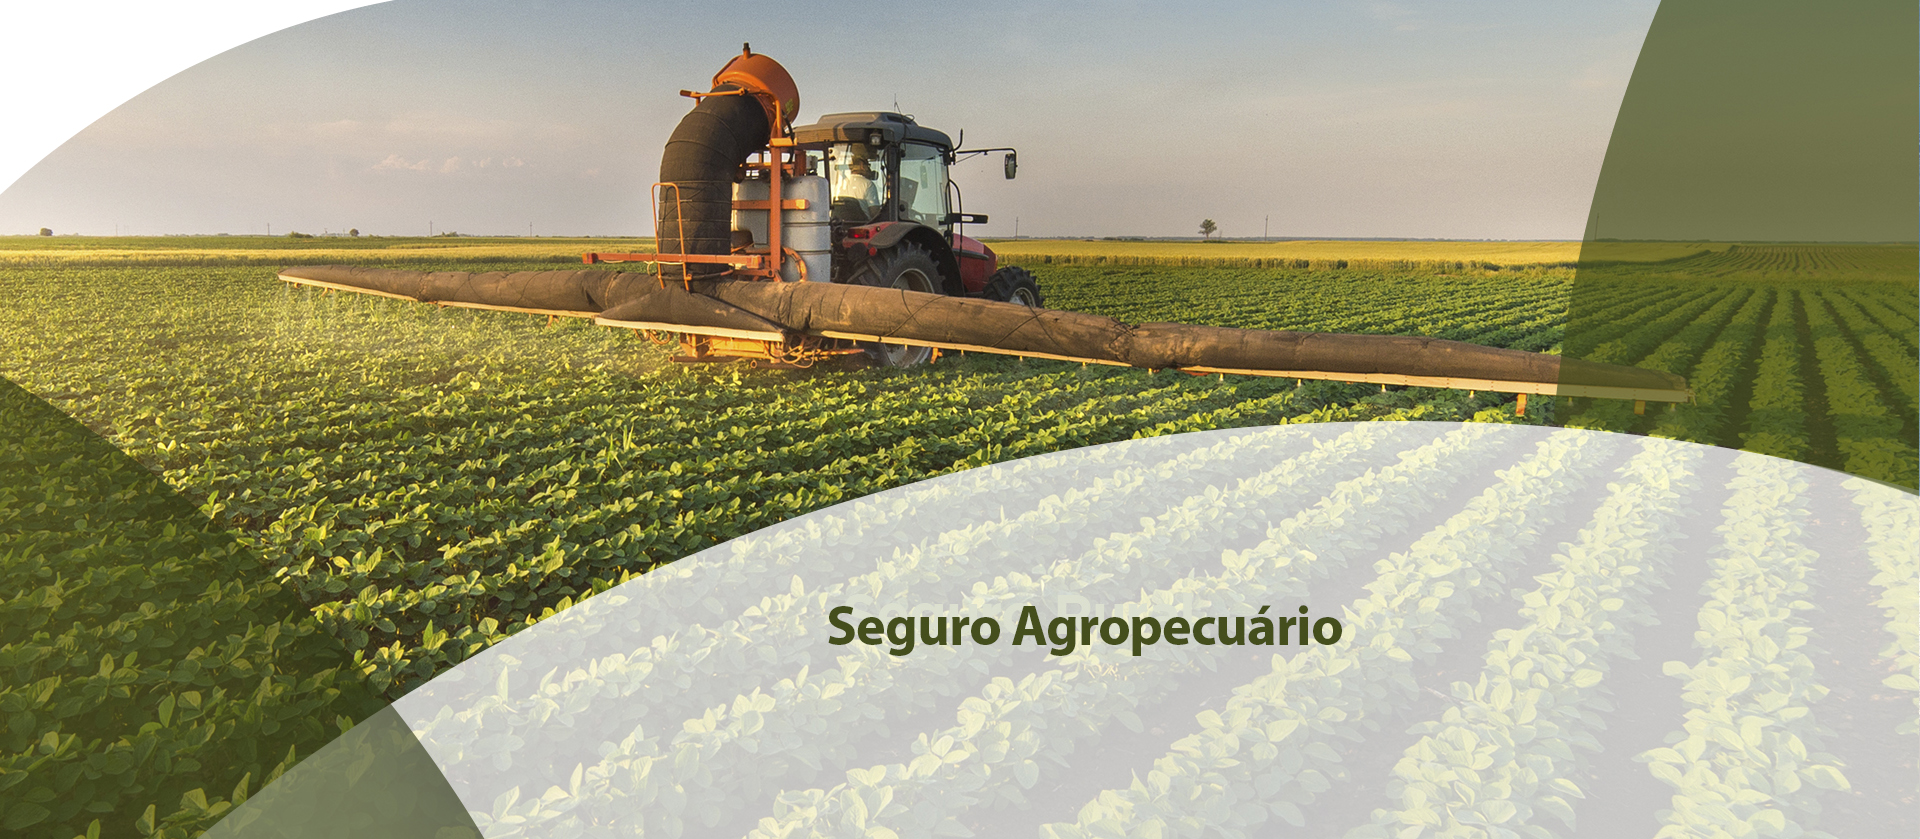 Agropecuário